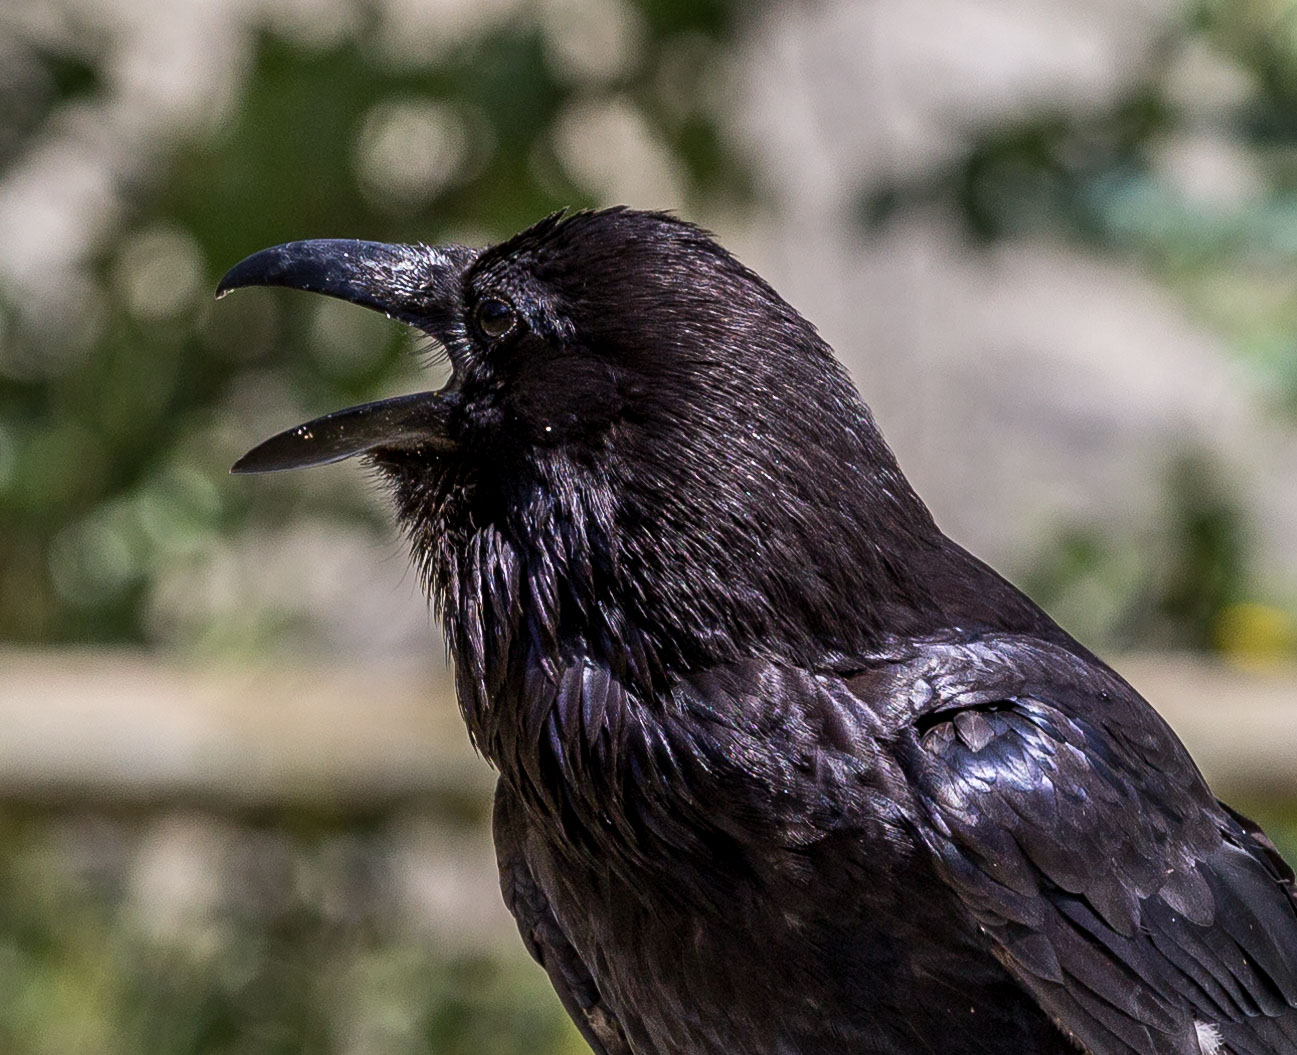 One of Banff National Park's enormous ravens. Dawn Page / CoastsideSlacking